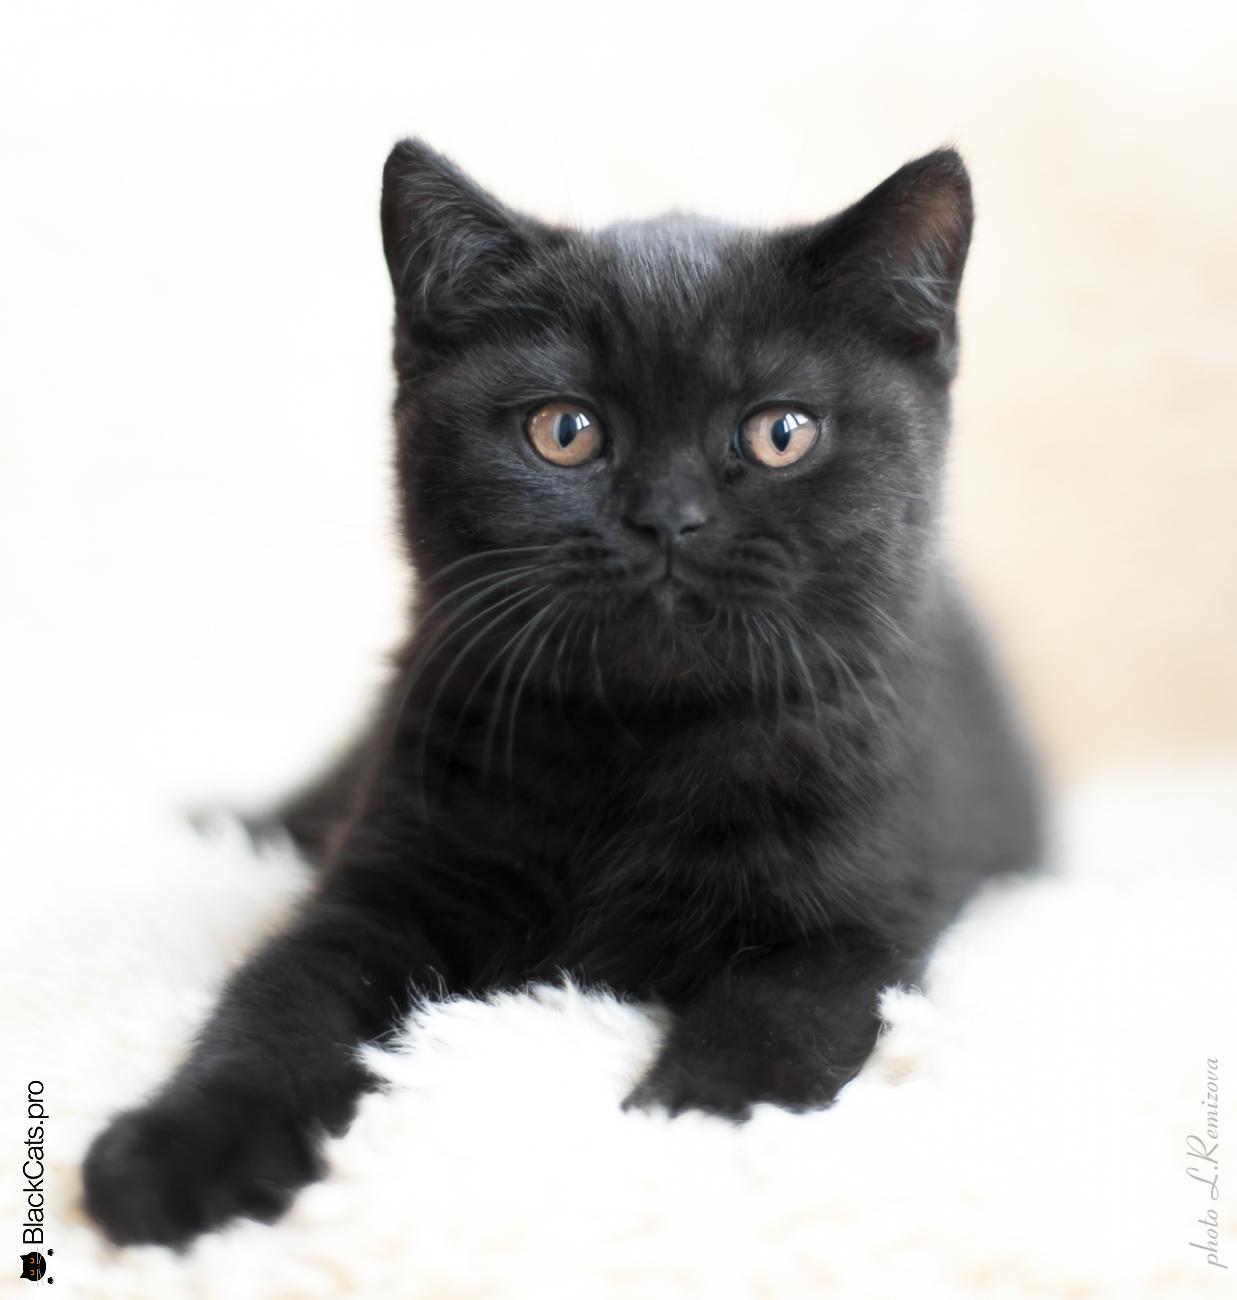 Tamerlan Black Jetstone 2 months 12 days